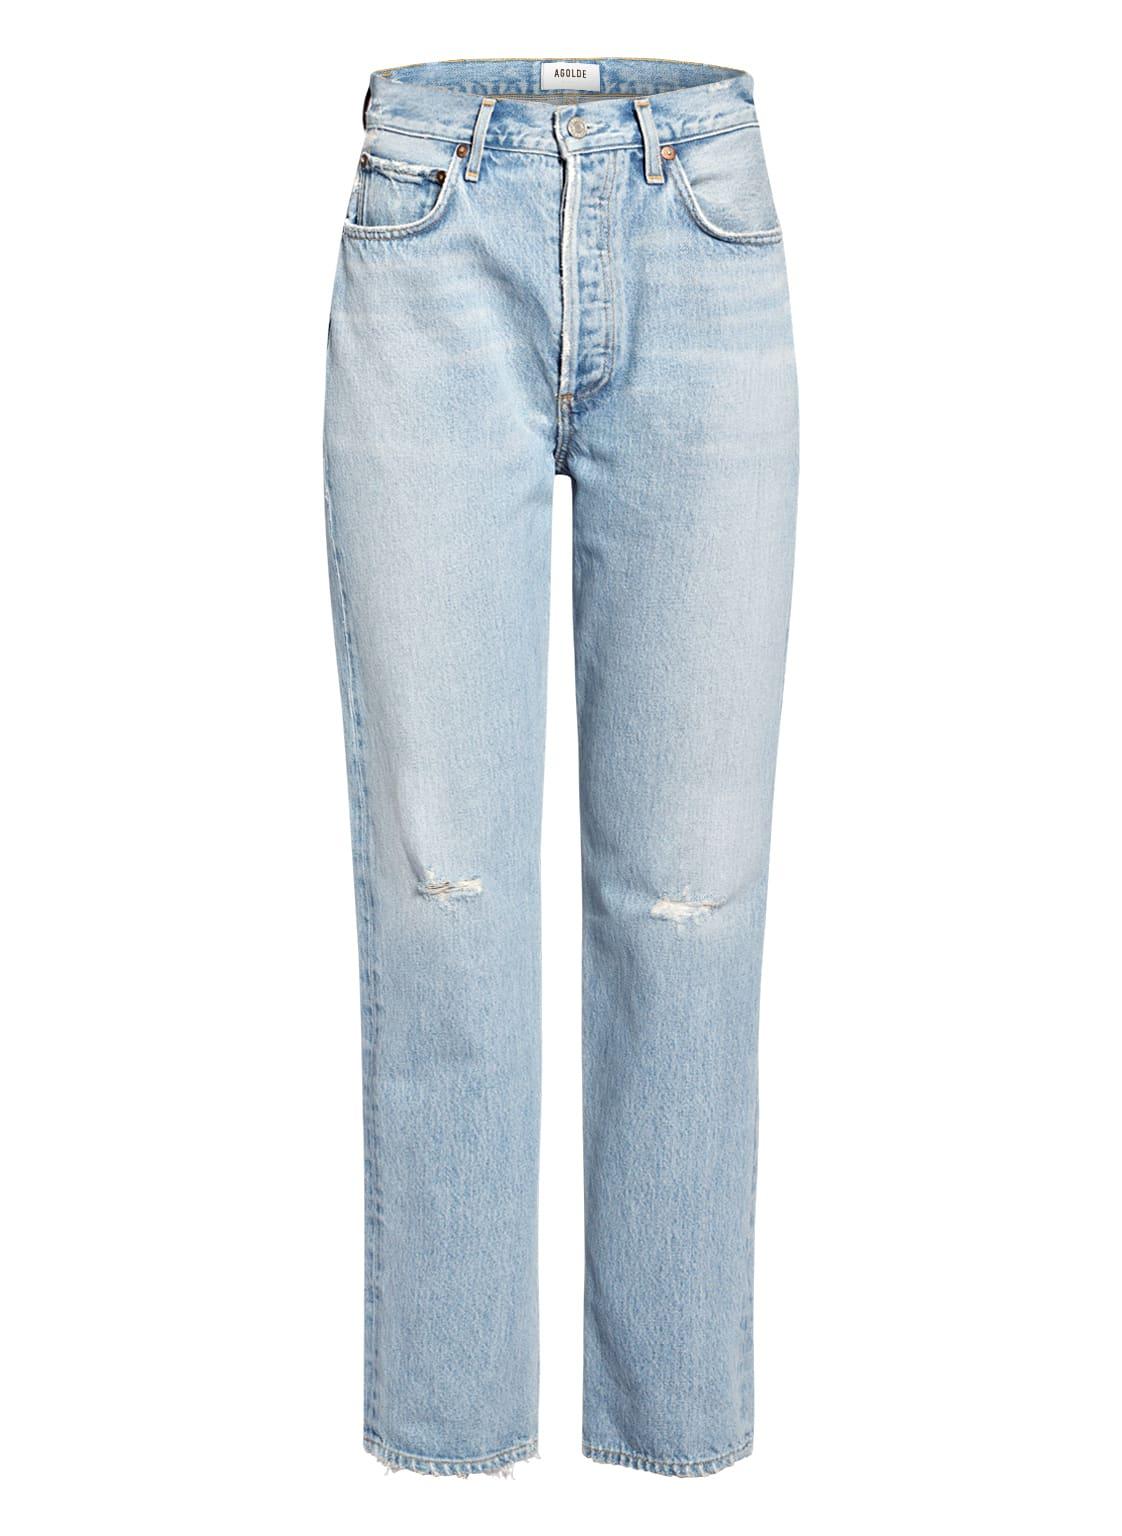 Image of Agolde Jeans Balloon blau